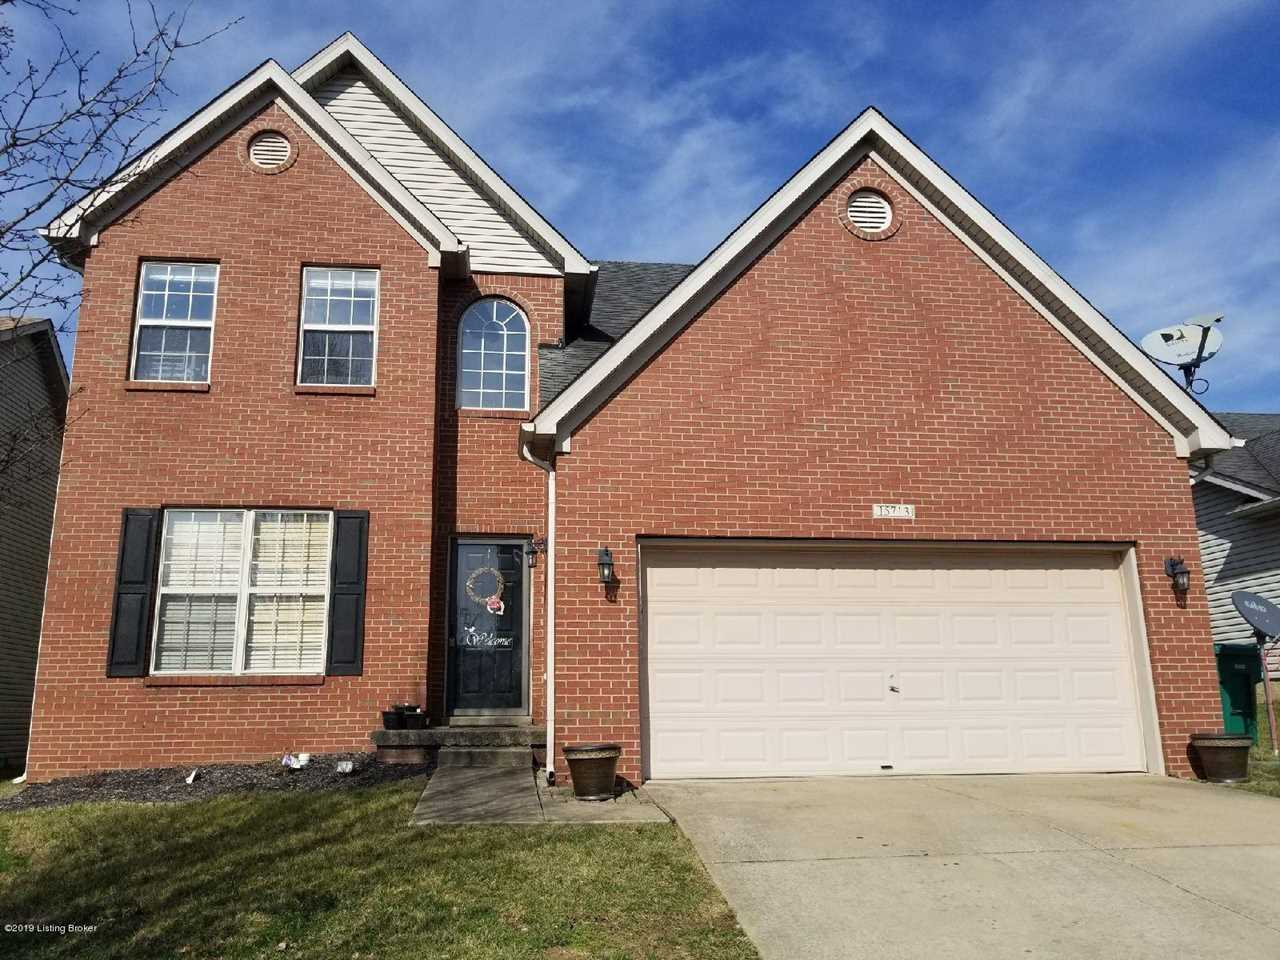 15713 Beckley Hills Dr Louisville KY 40245   MLS#1524399 Photo 1